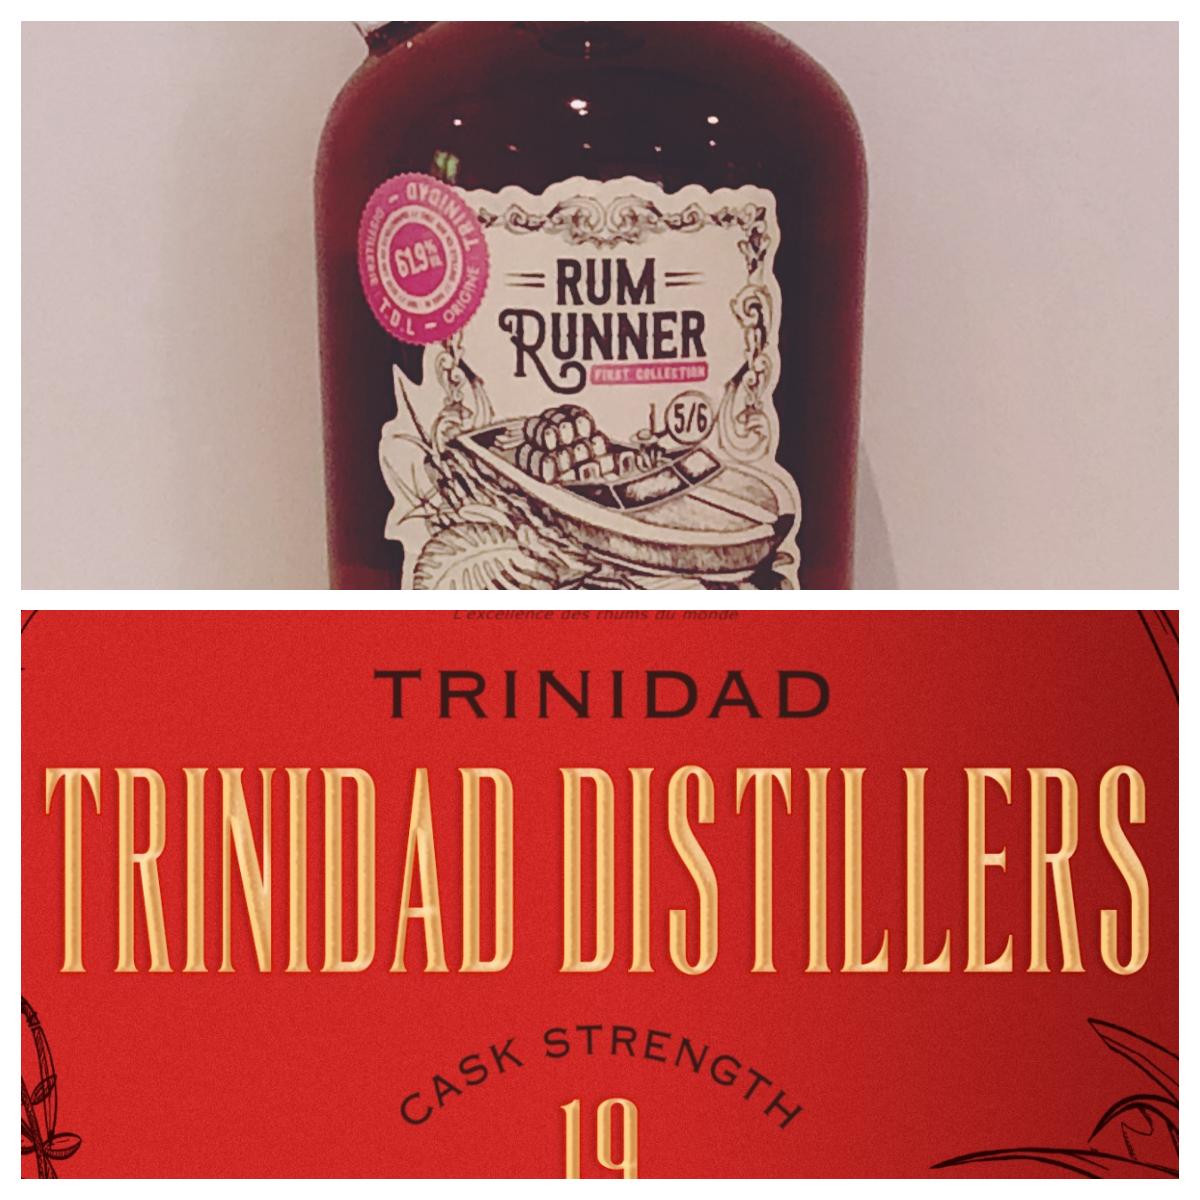 Trinidad – Excellence Rhum et Rum Runner